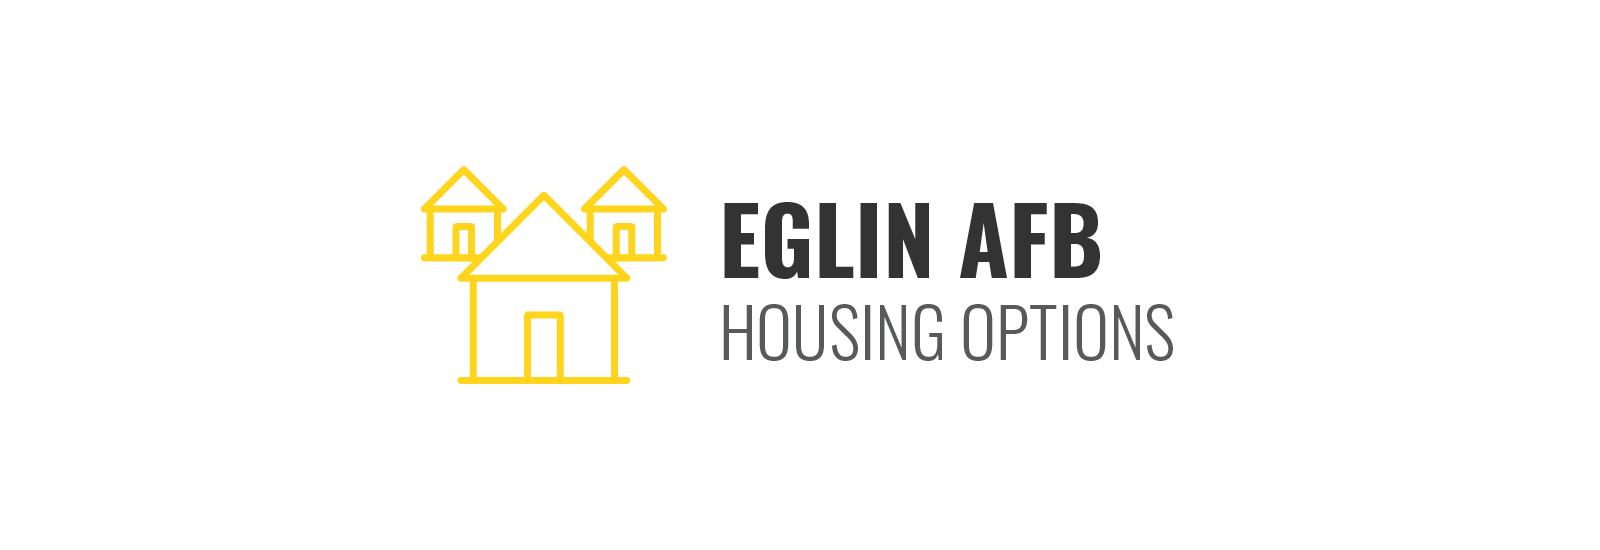 Eglin AFB Housing Options